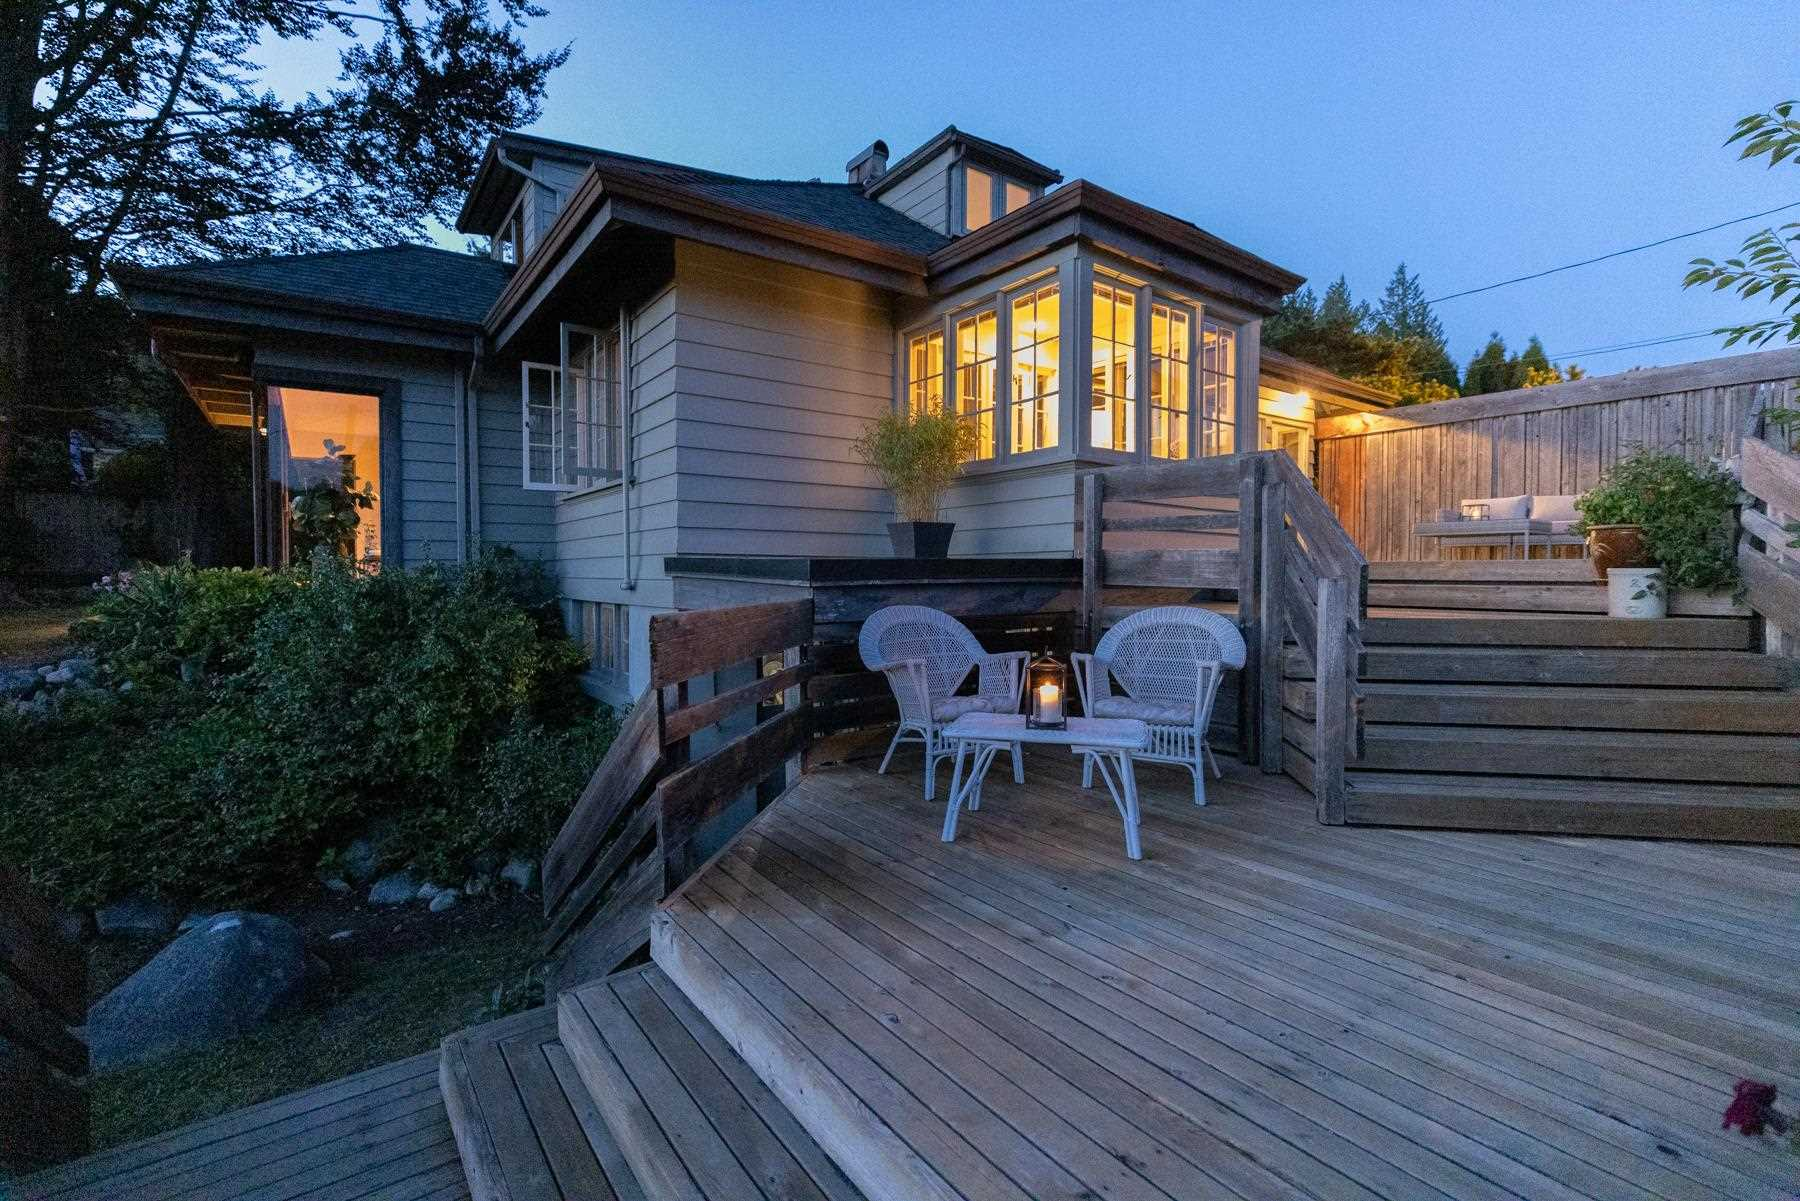 2040 GRAND BOULEVARD - Boulevard House/Single Family for sale, 4 Bedrooms (R2606188) - #1